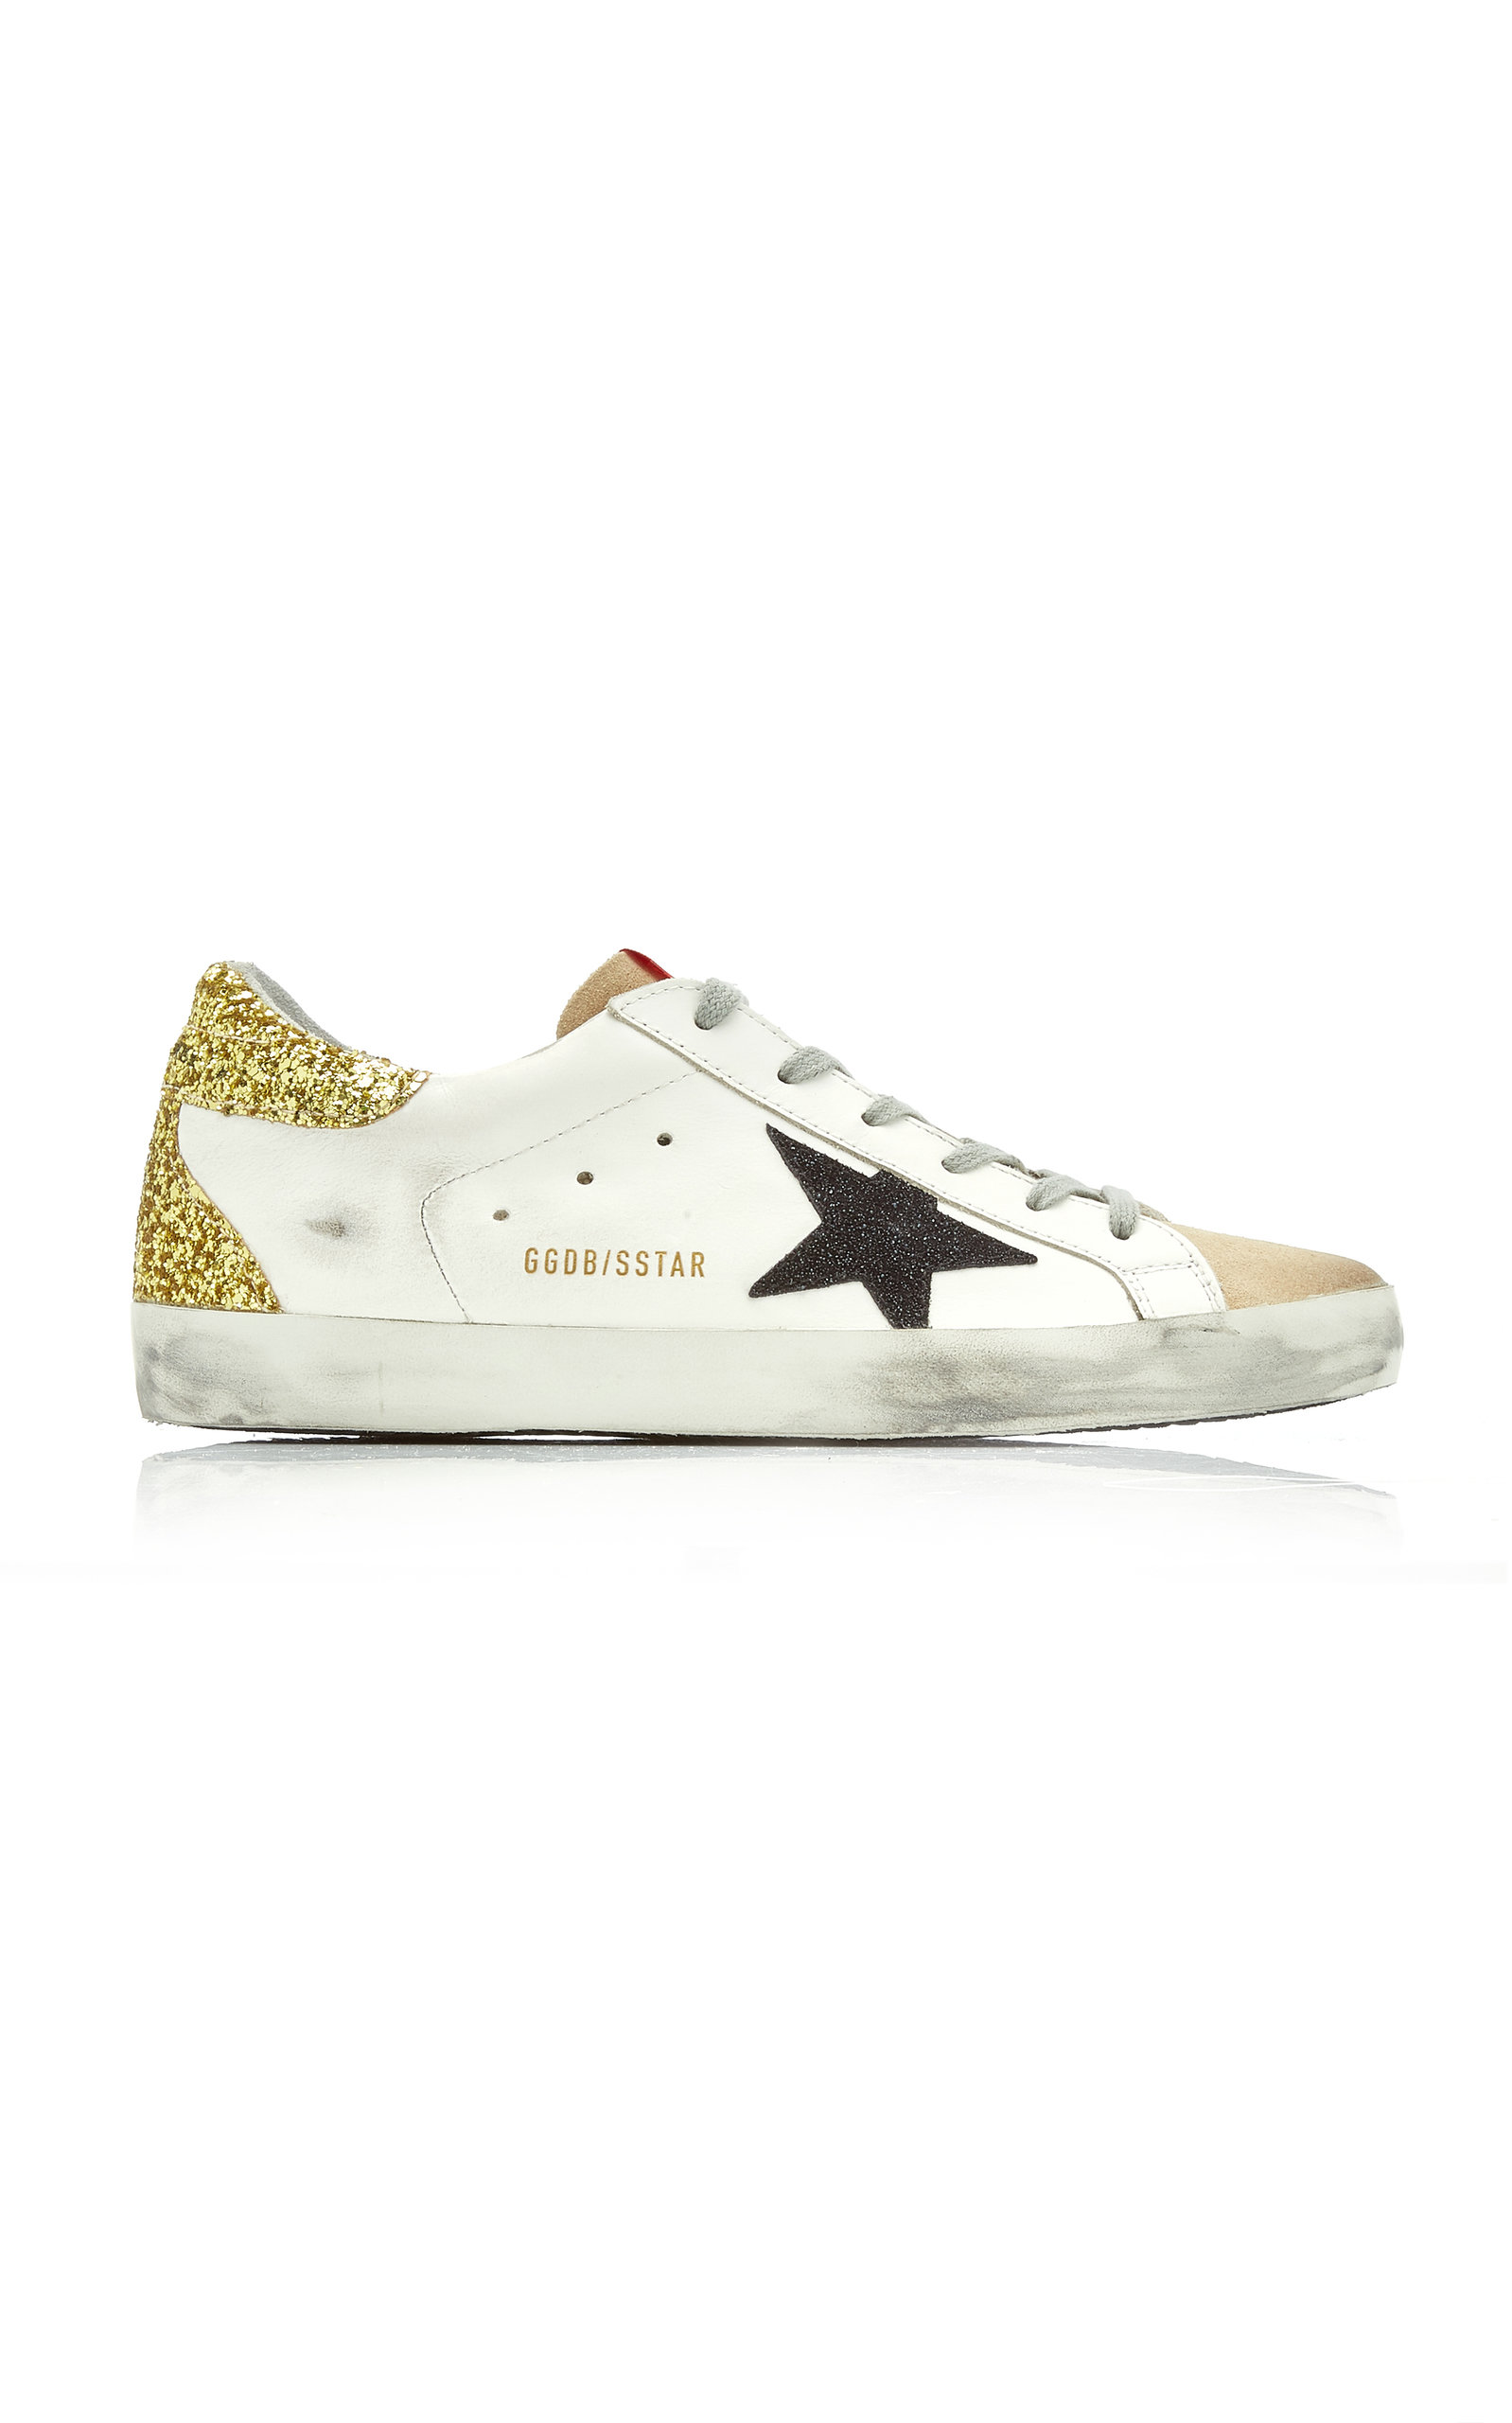 Golden Goose - Women's Superstar Glitter-Detail Leather Sneakers  - Multi - Moda Operandi